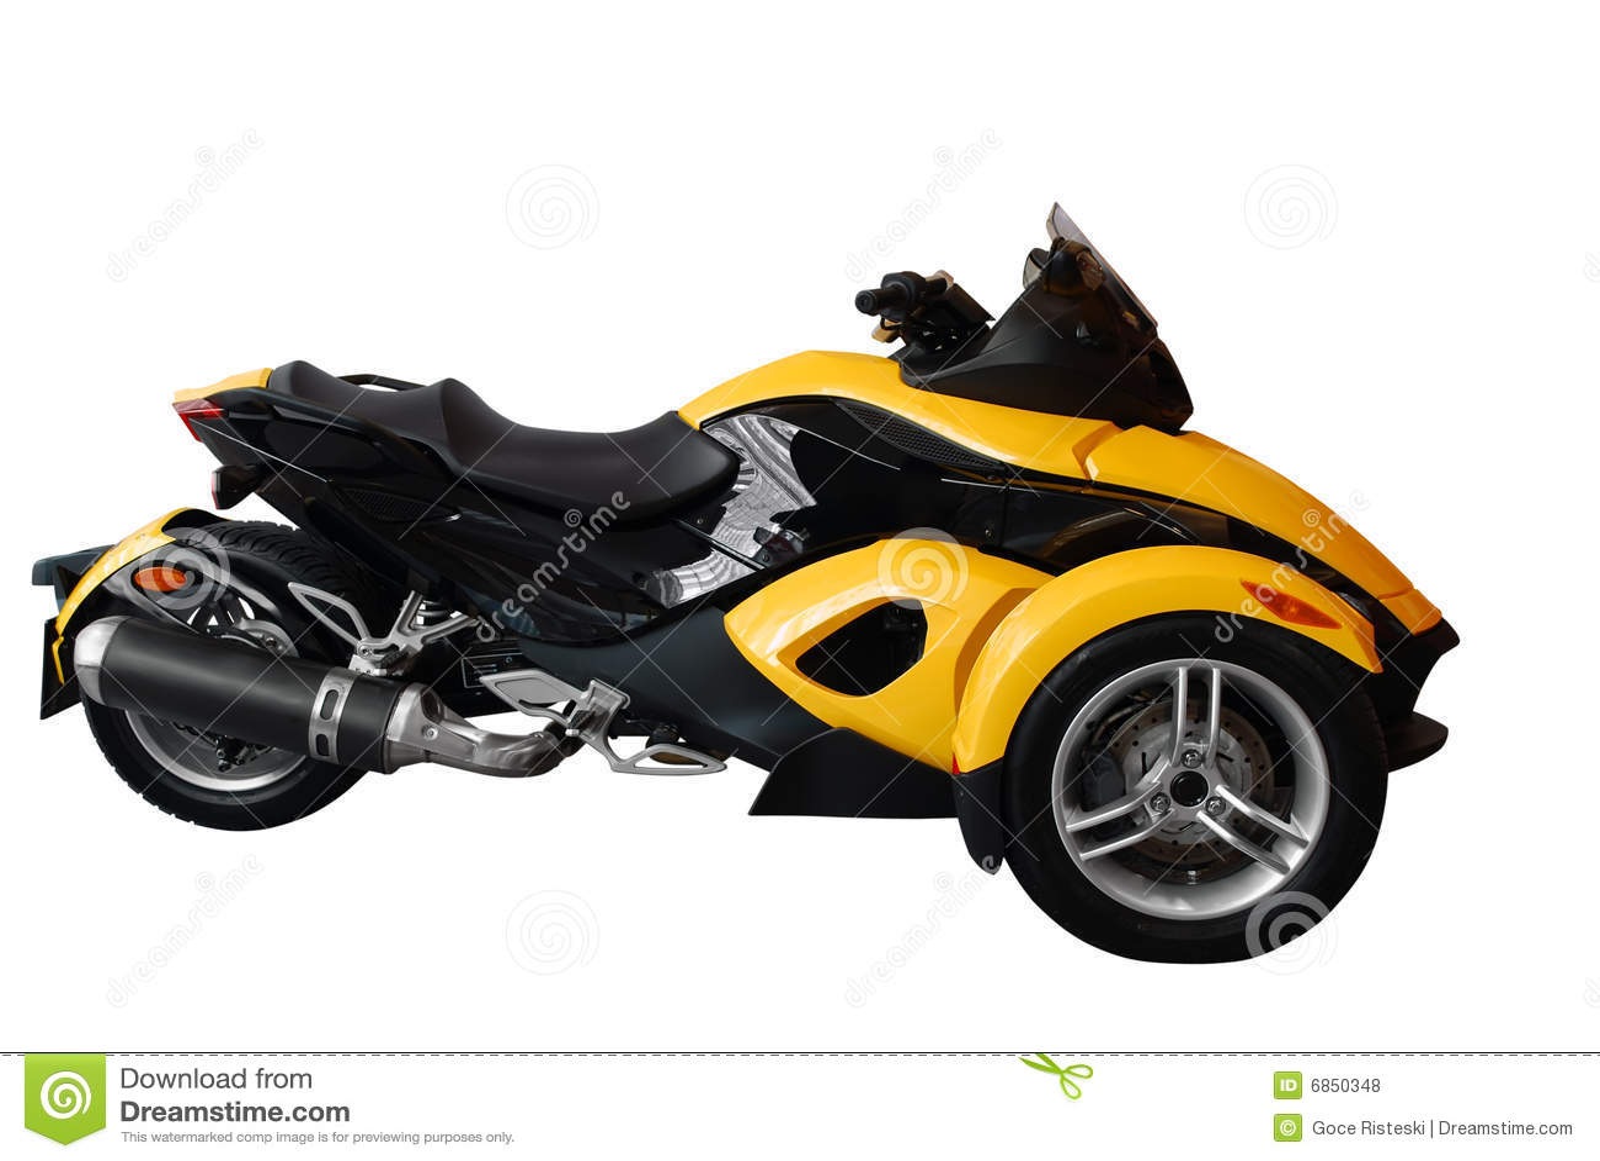 Snelle Motor Met Drie Wielen Royalty vrije Stock Foto u0026#39;s   Afbeelding  6850348